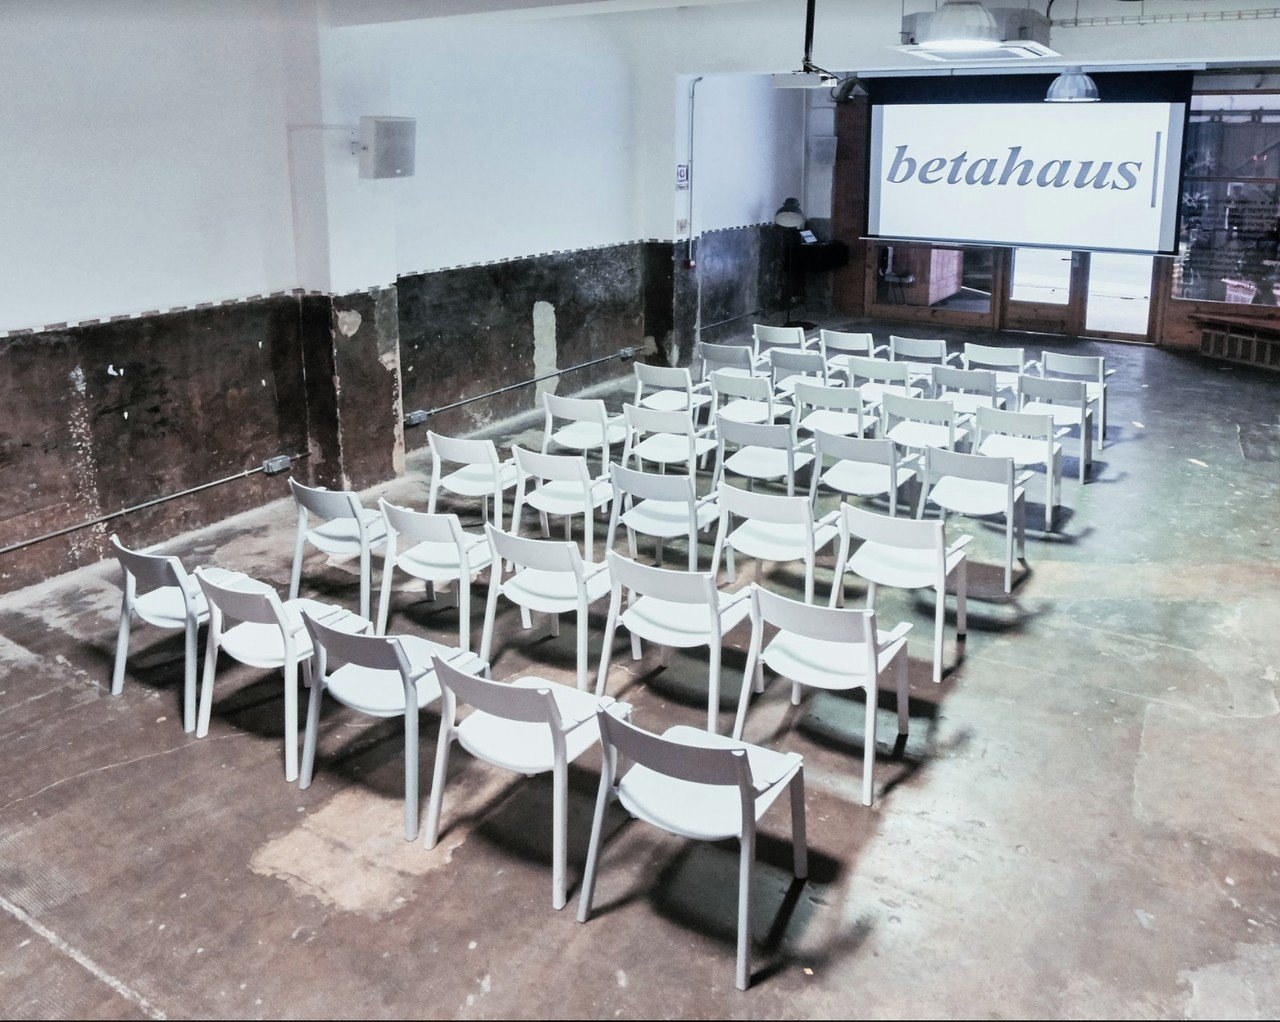 Barcelone training rooms Espace de Coworking Arena image 4